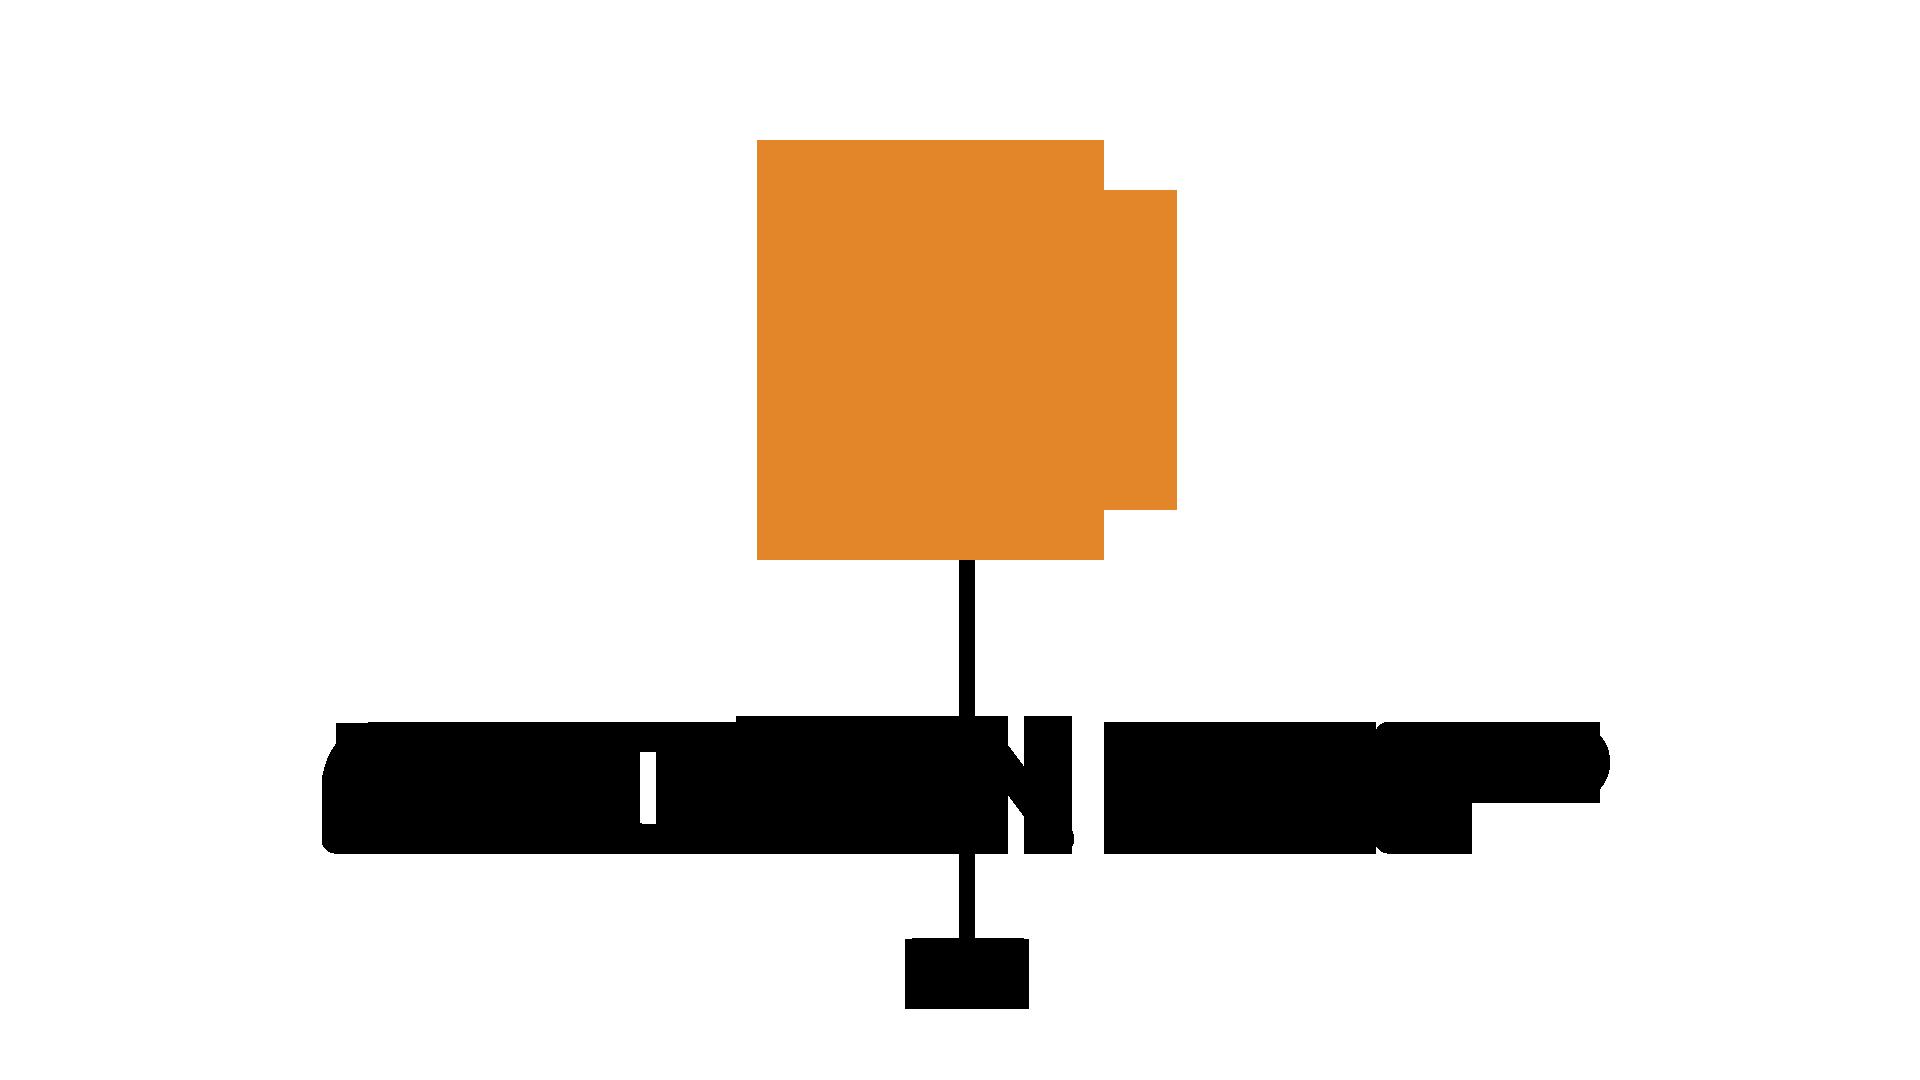 Ncaep logo